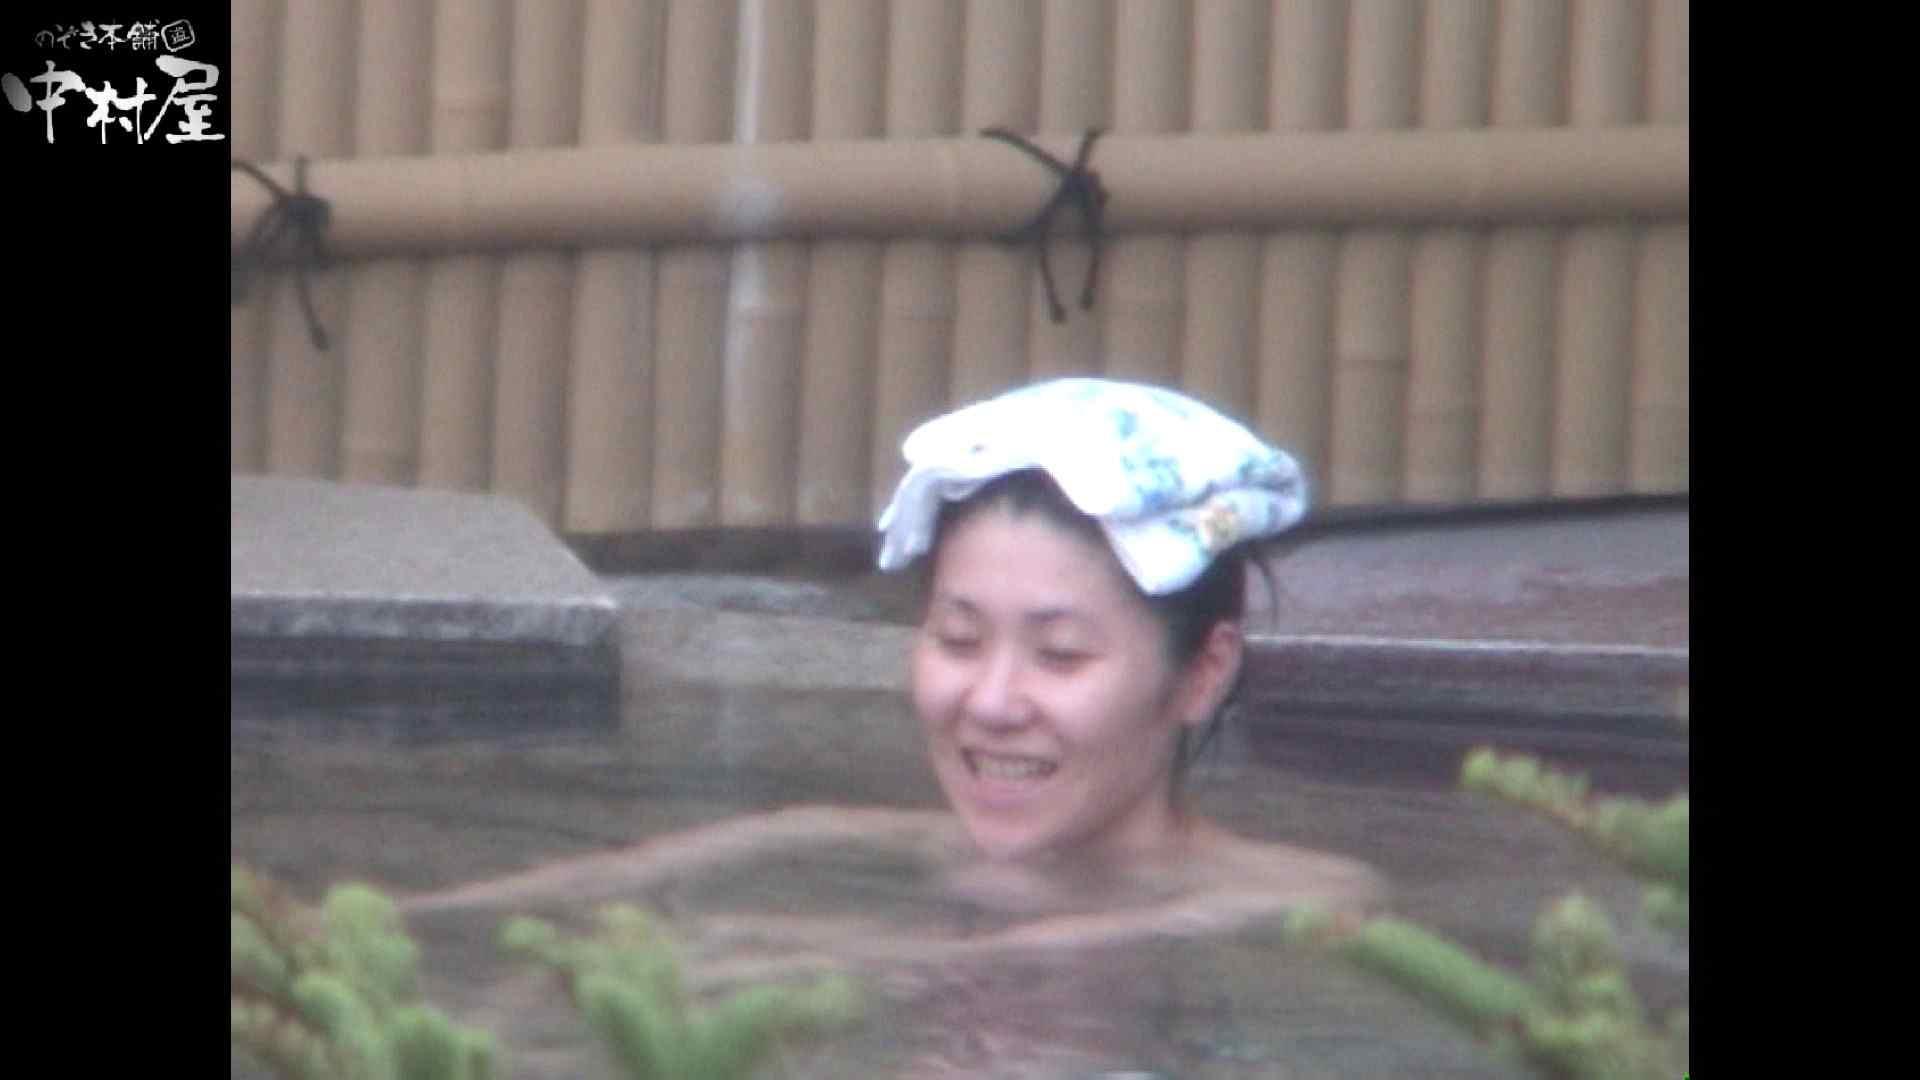 Aquaな露天風呂Vol.925 盗撮シリーズ | 露天風呂編  77PIX 33